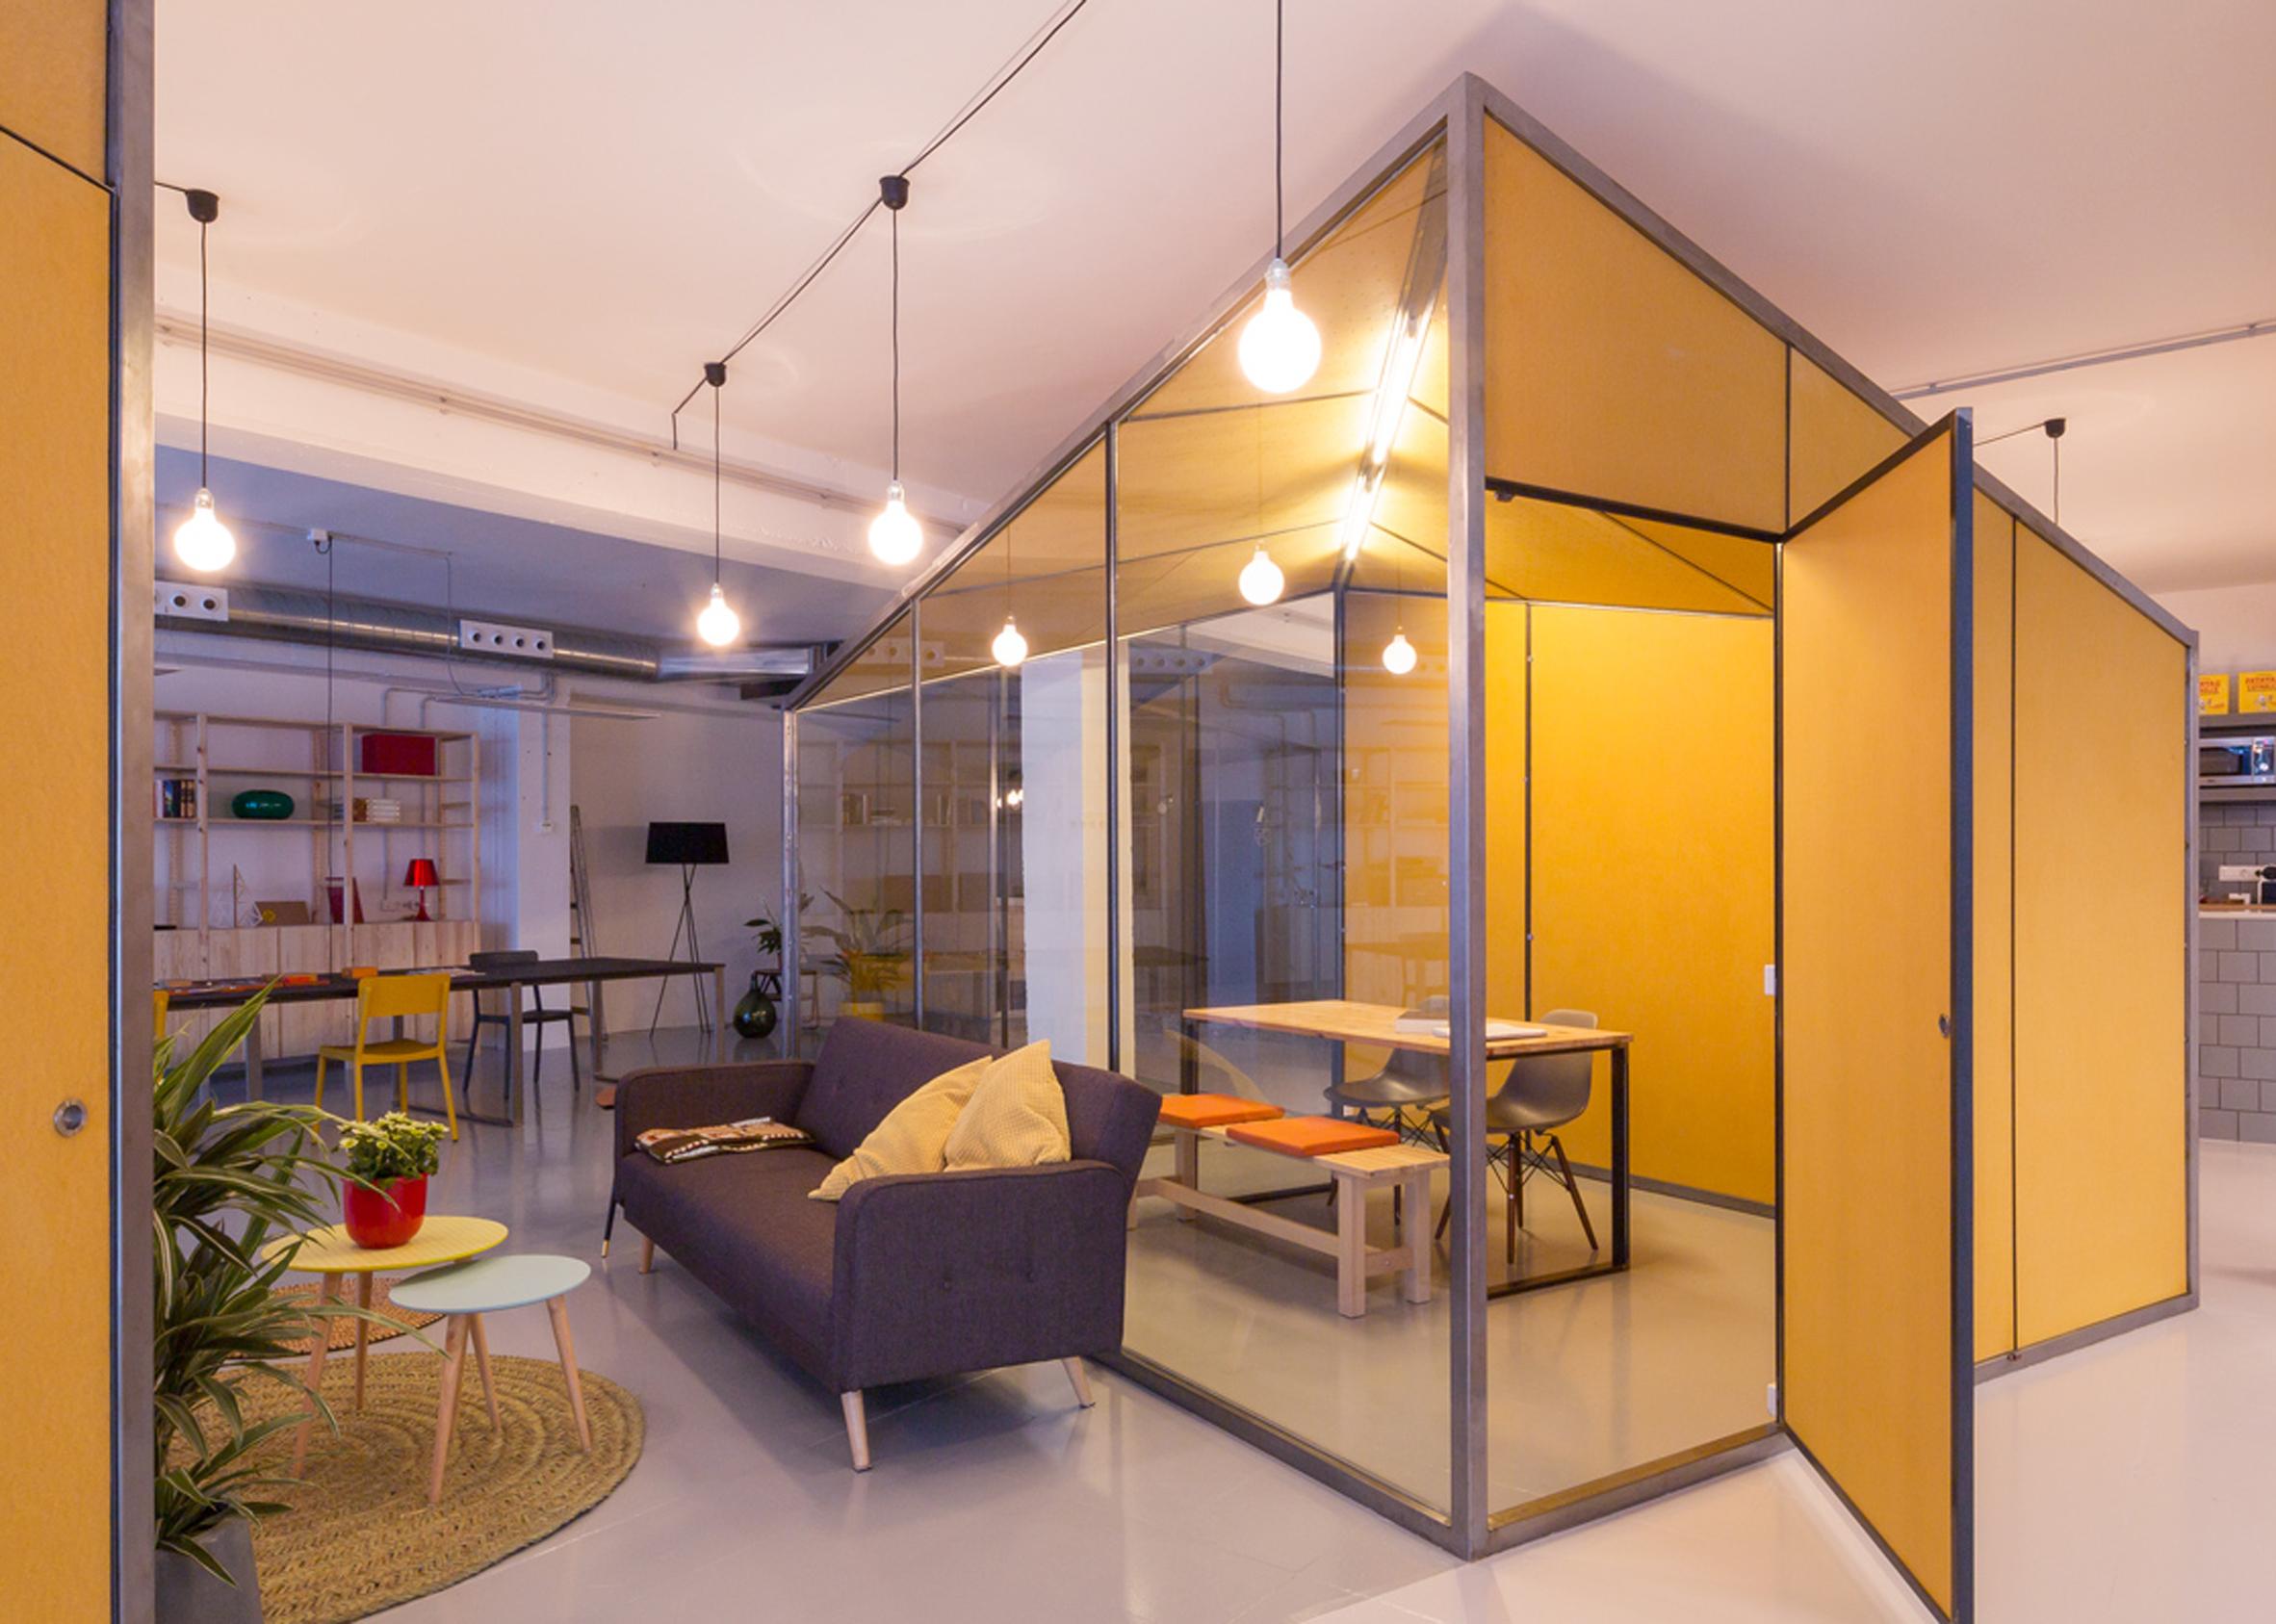 Nook Architects